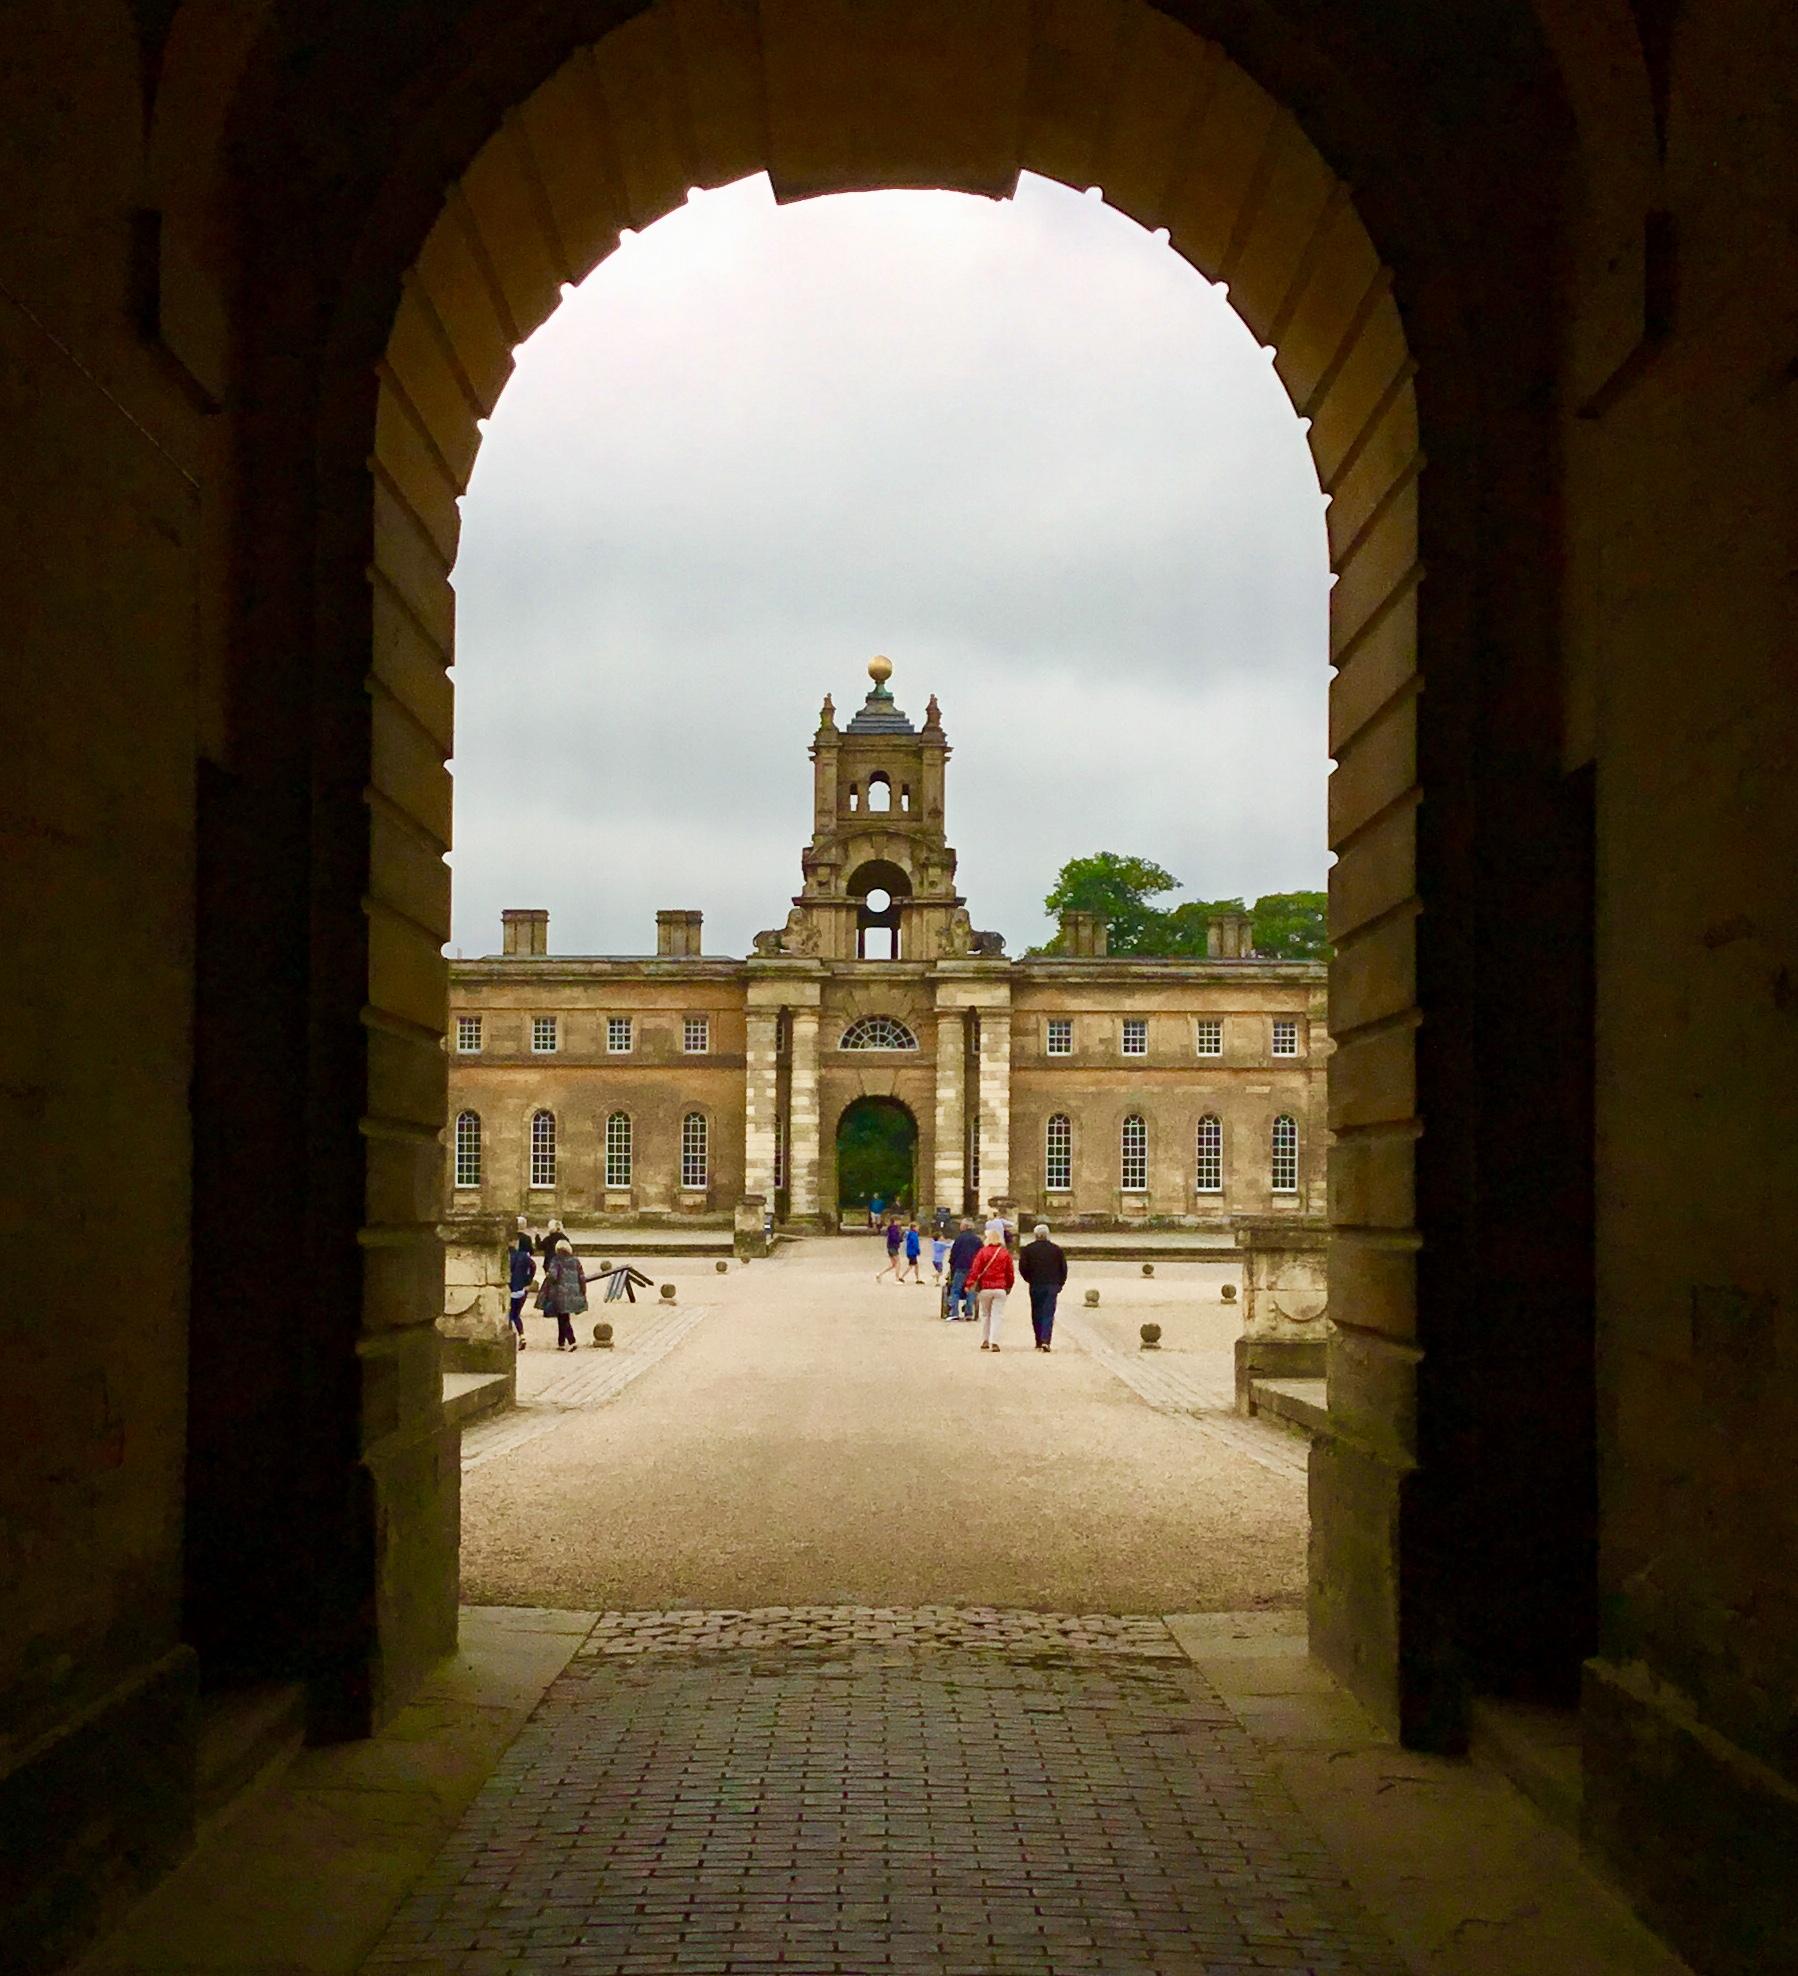 First sight of Blenheim Palace